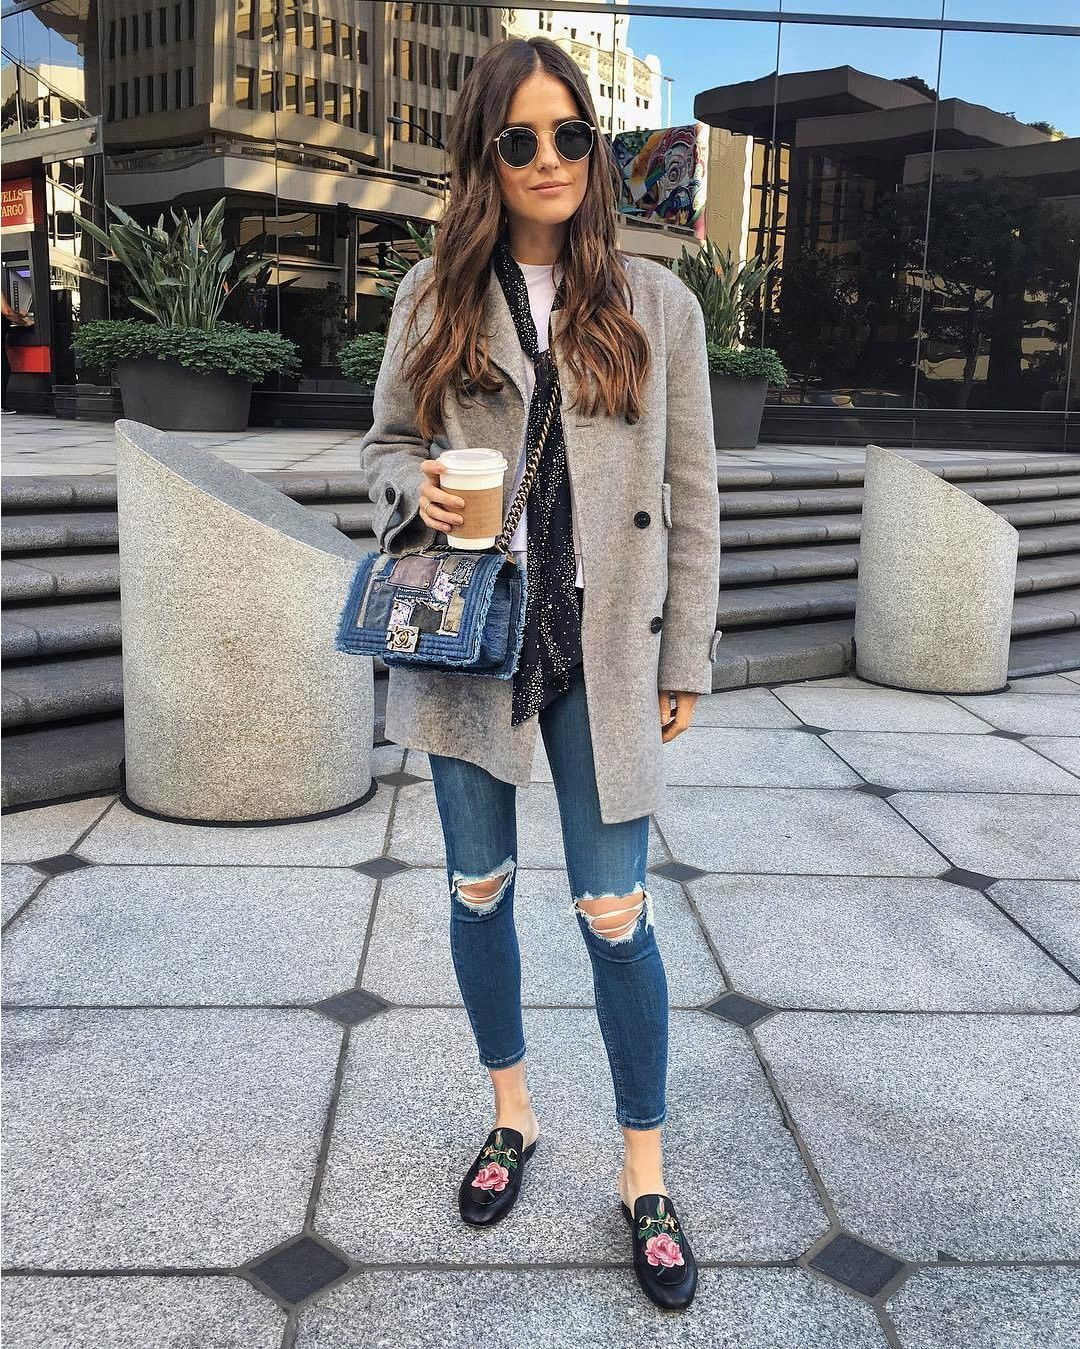 77cc21f420c Photo @blankitinerary #womanslook • обувь Princetown leather slipper от # gucci • сумка Boy shoulder bag от #chanel.